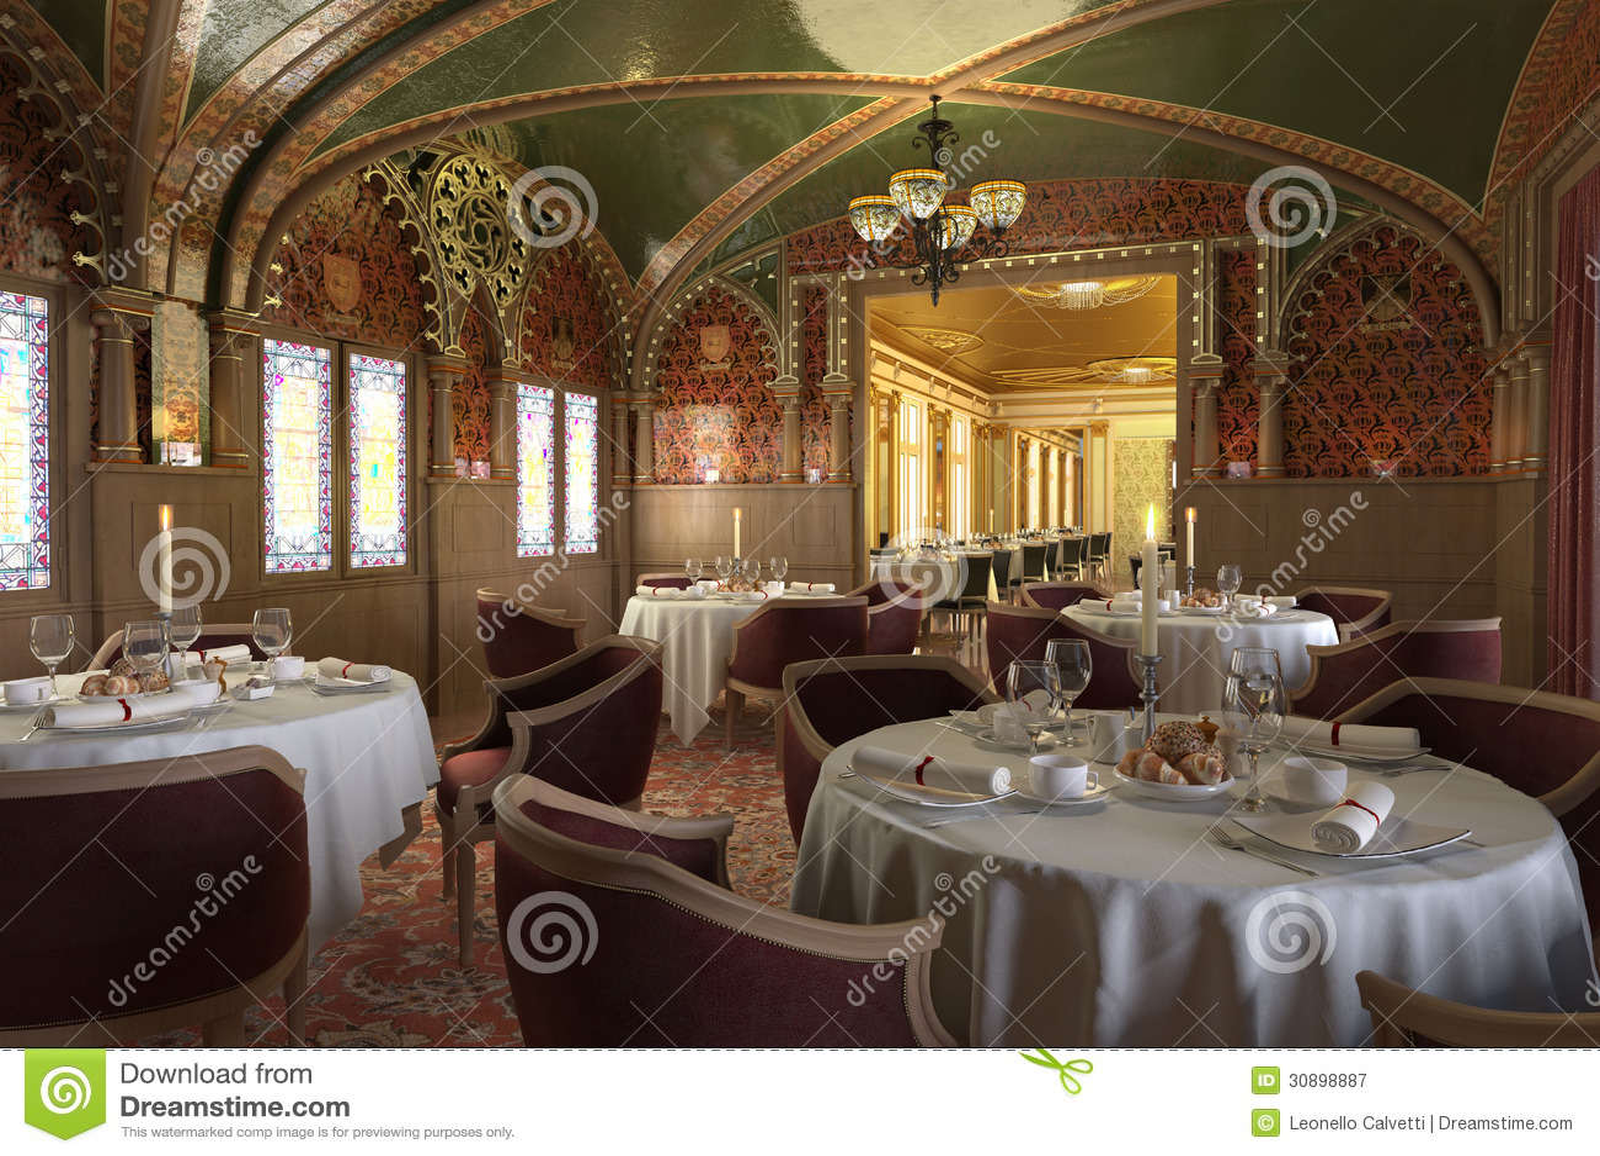 old antique restaurant interior with decorations stock. Black Bedroom Furniture Sets. Home Design Ideas